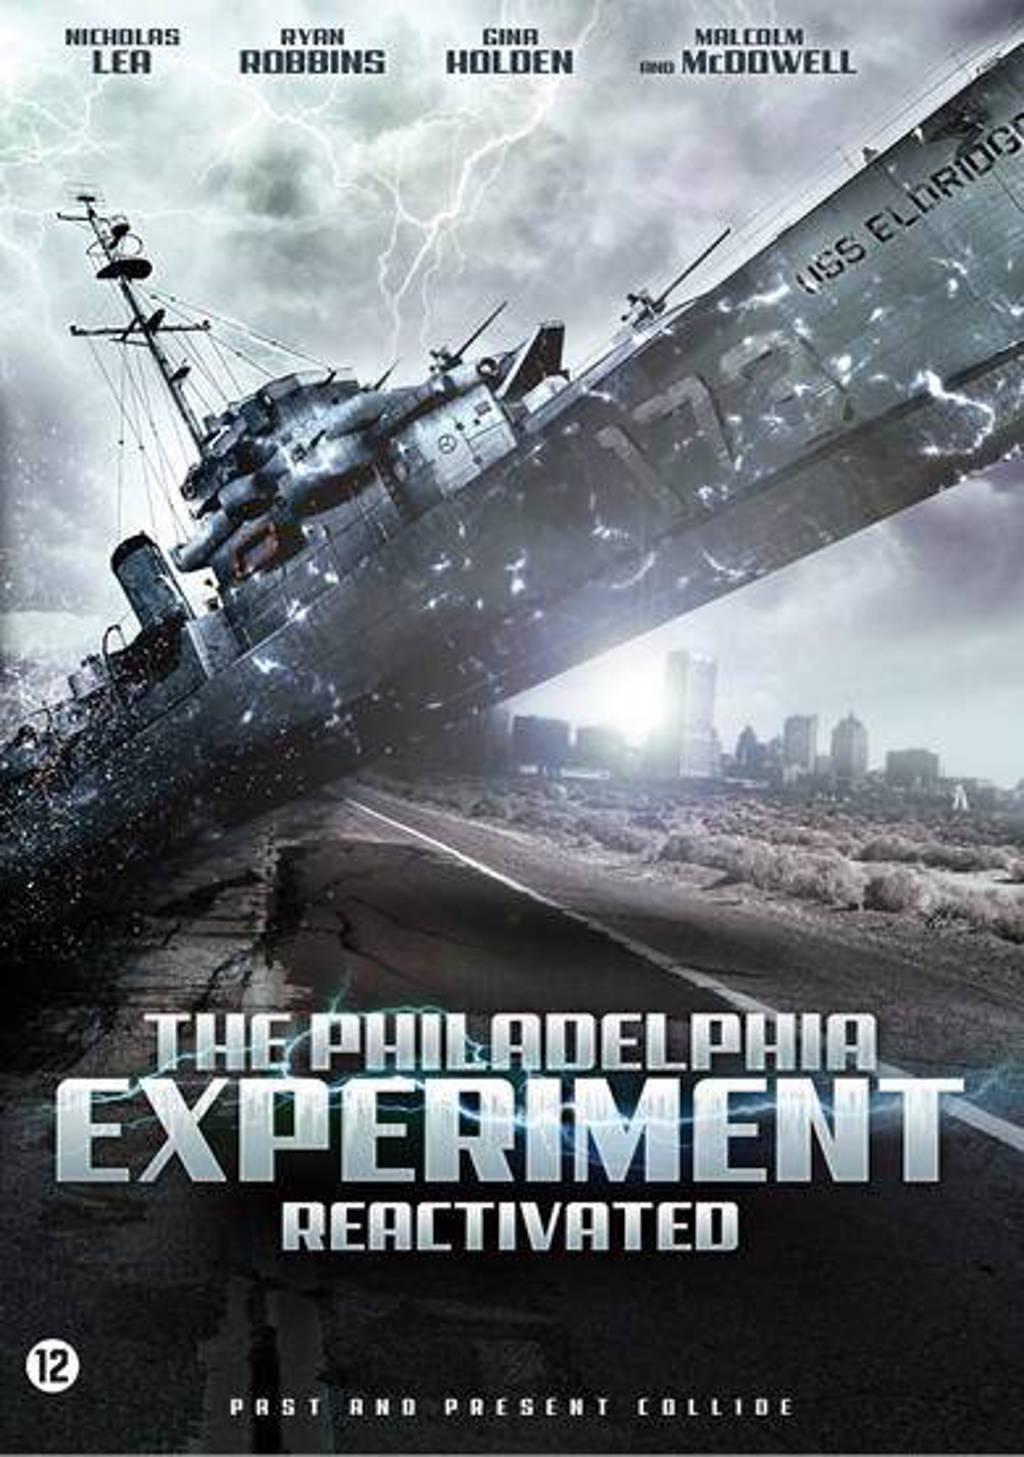 Philadelphia experiment reactivated (DVD)